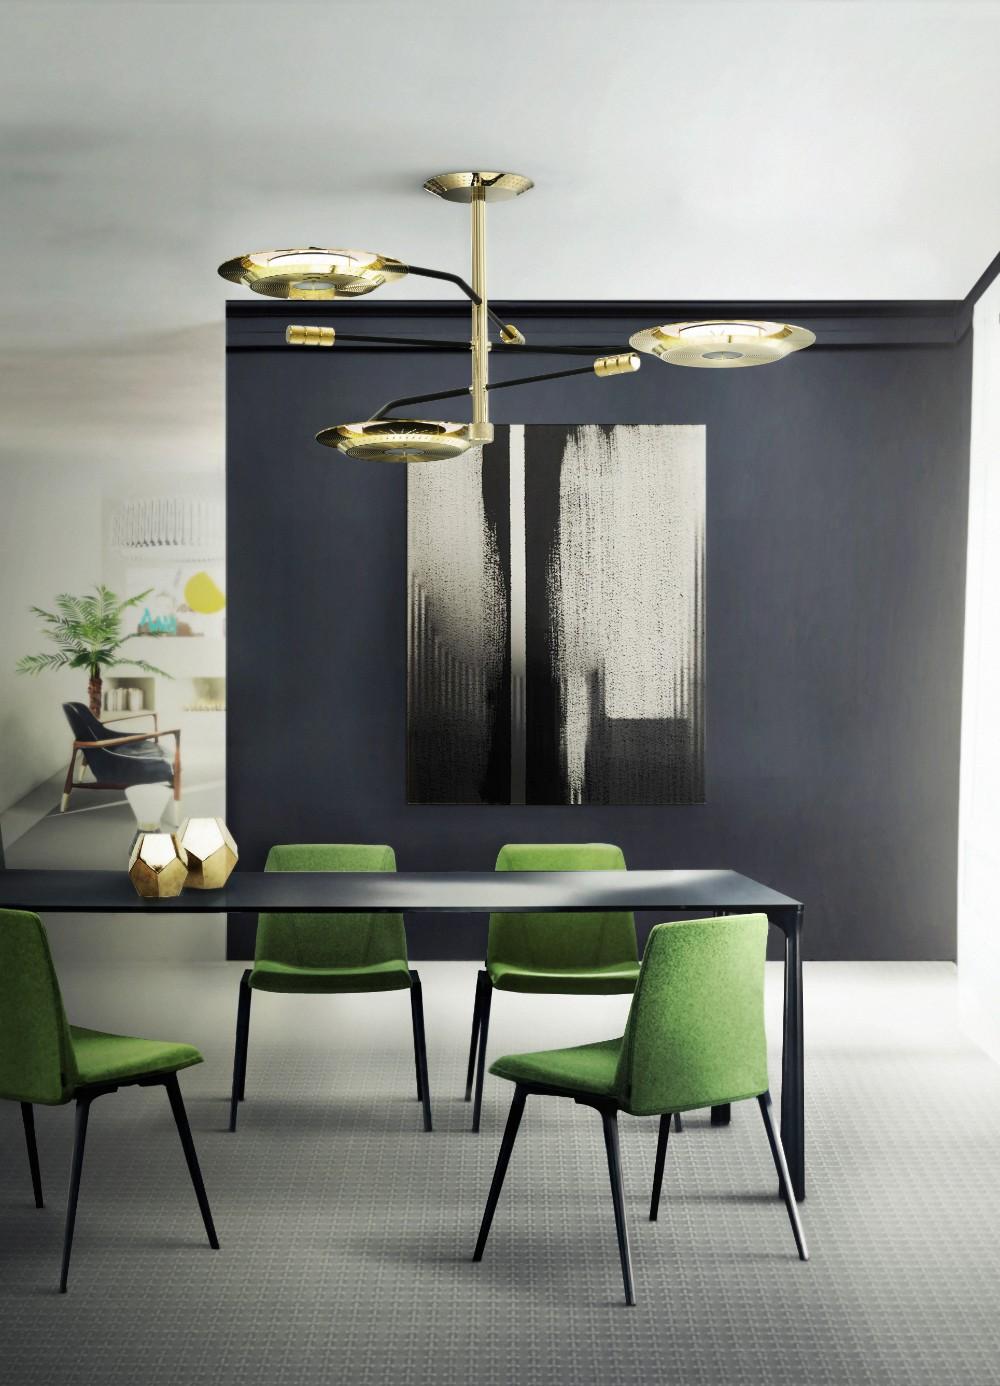 chalkboard 10 Chalkboard Dining Room Designs delightfull hendrix midcentury modern suspension lamp 1